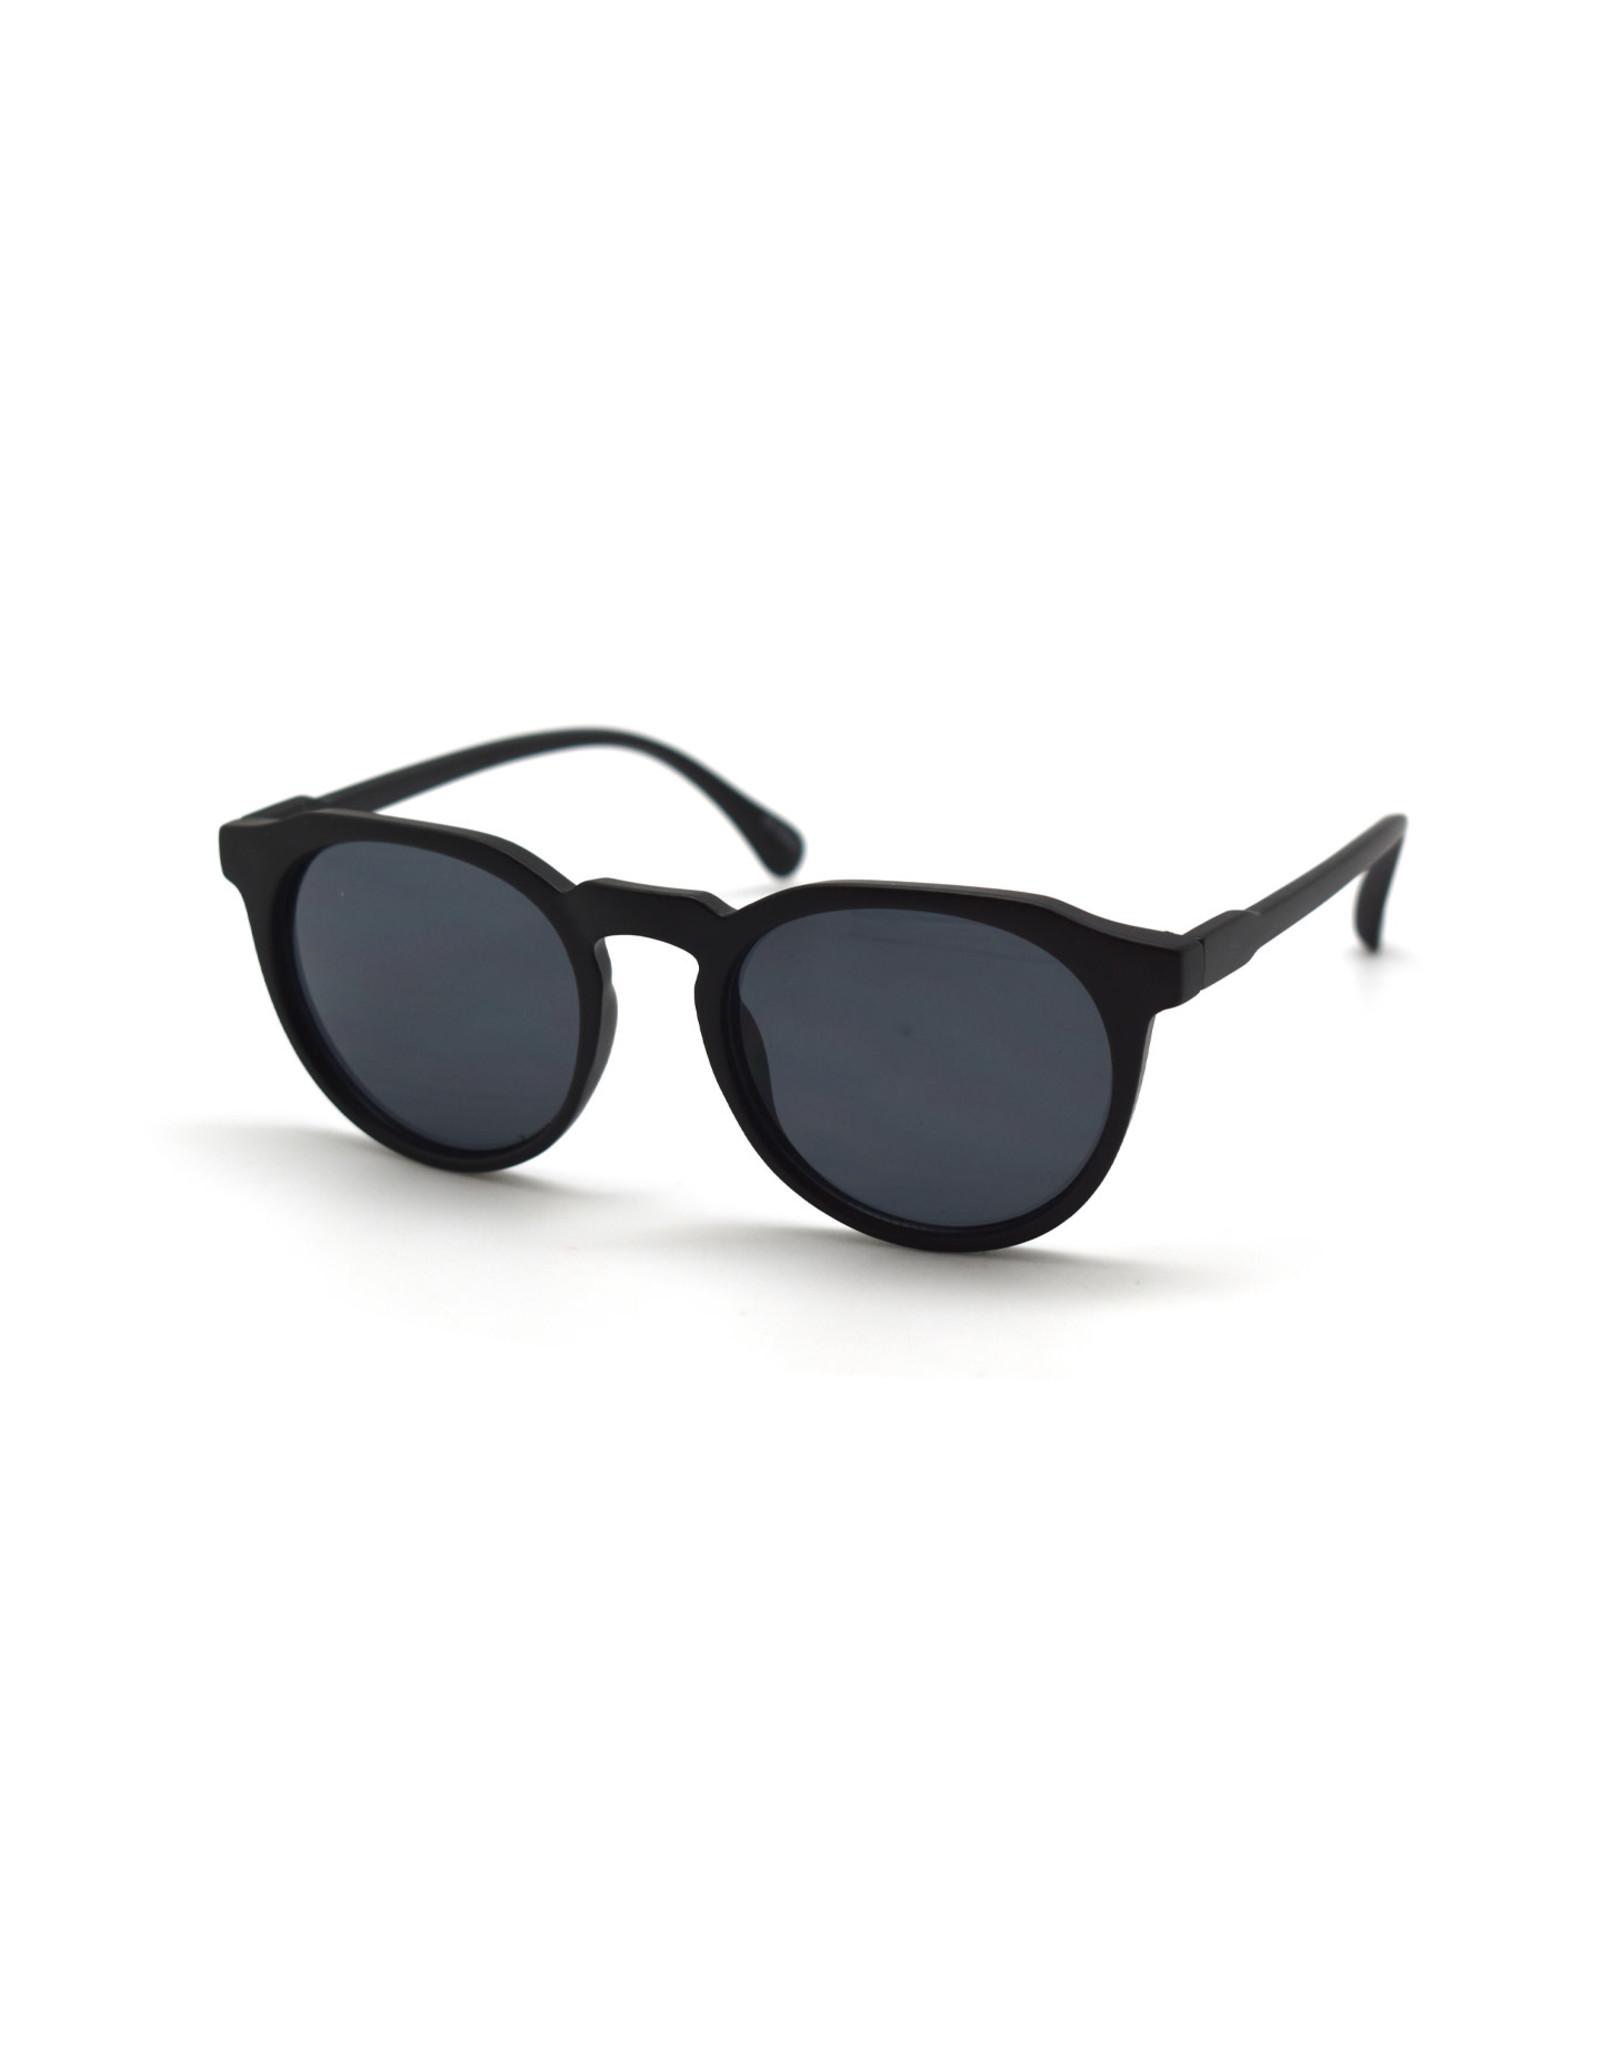 Clyde Sunglasses